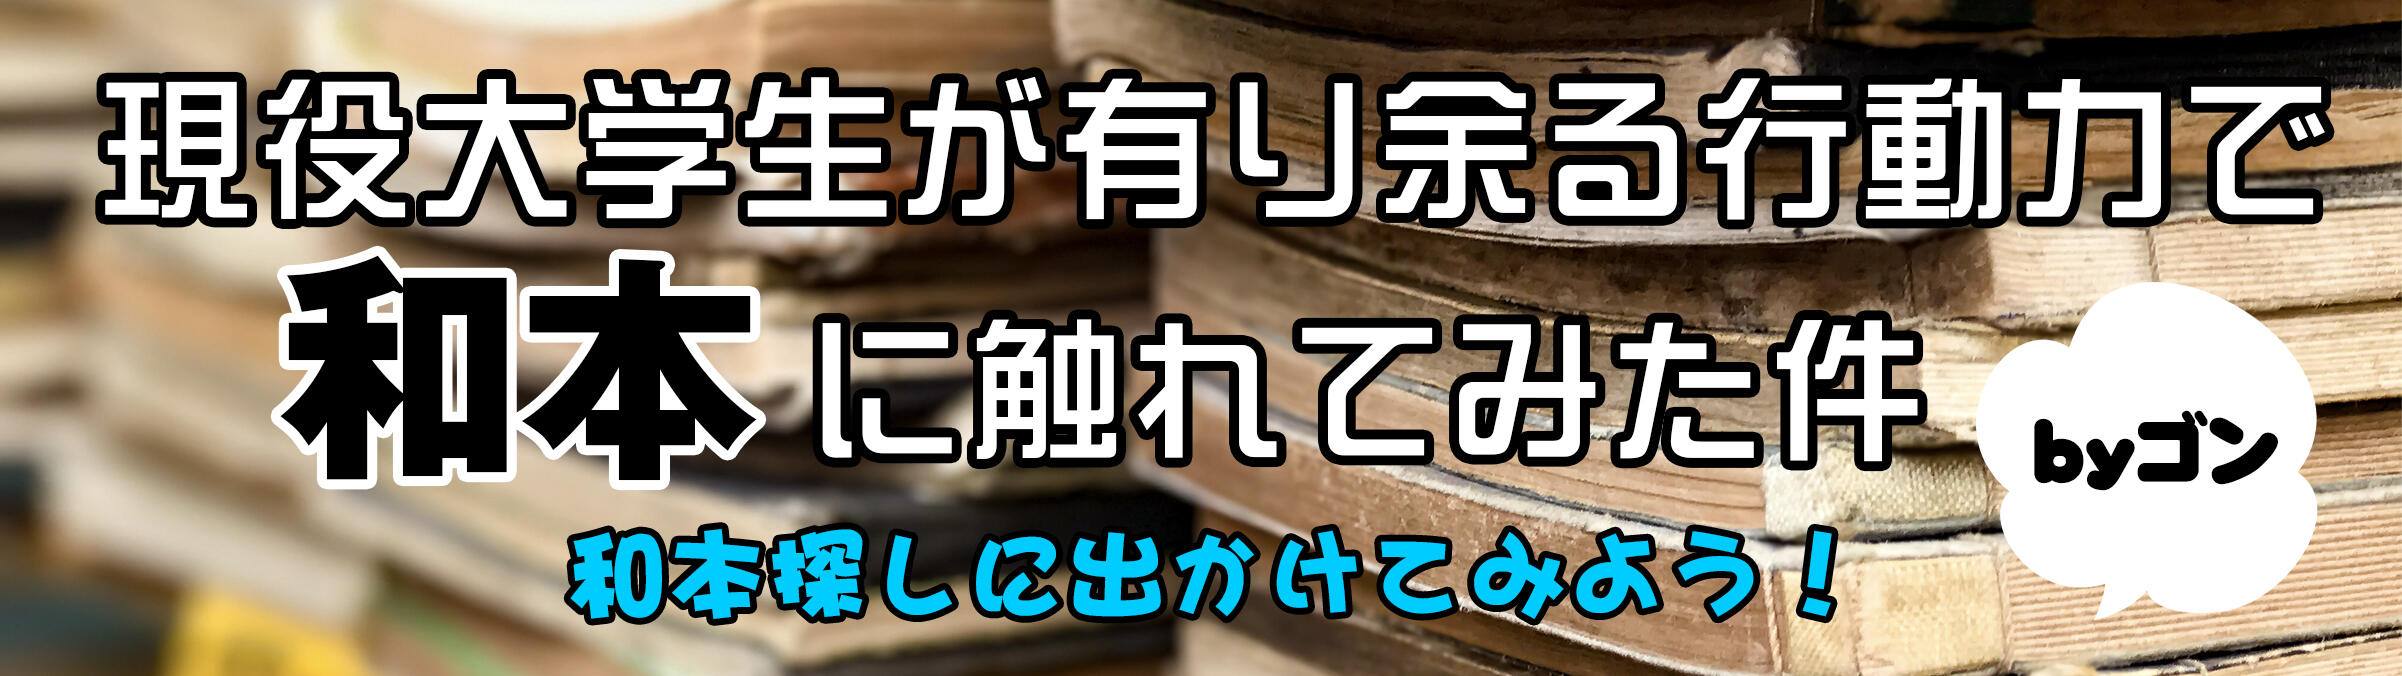 wahonari_bn.jpg